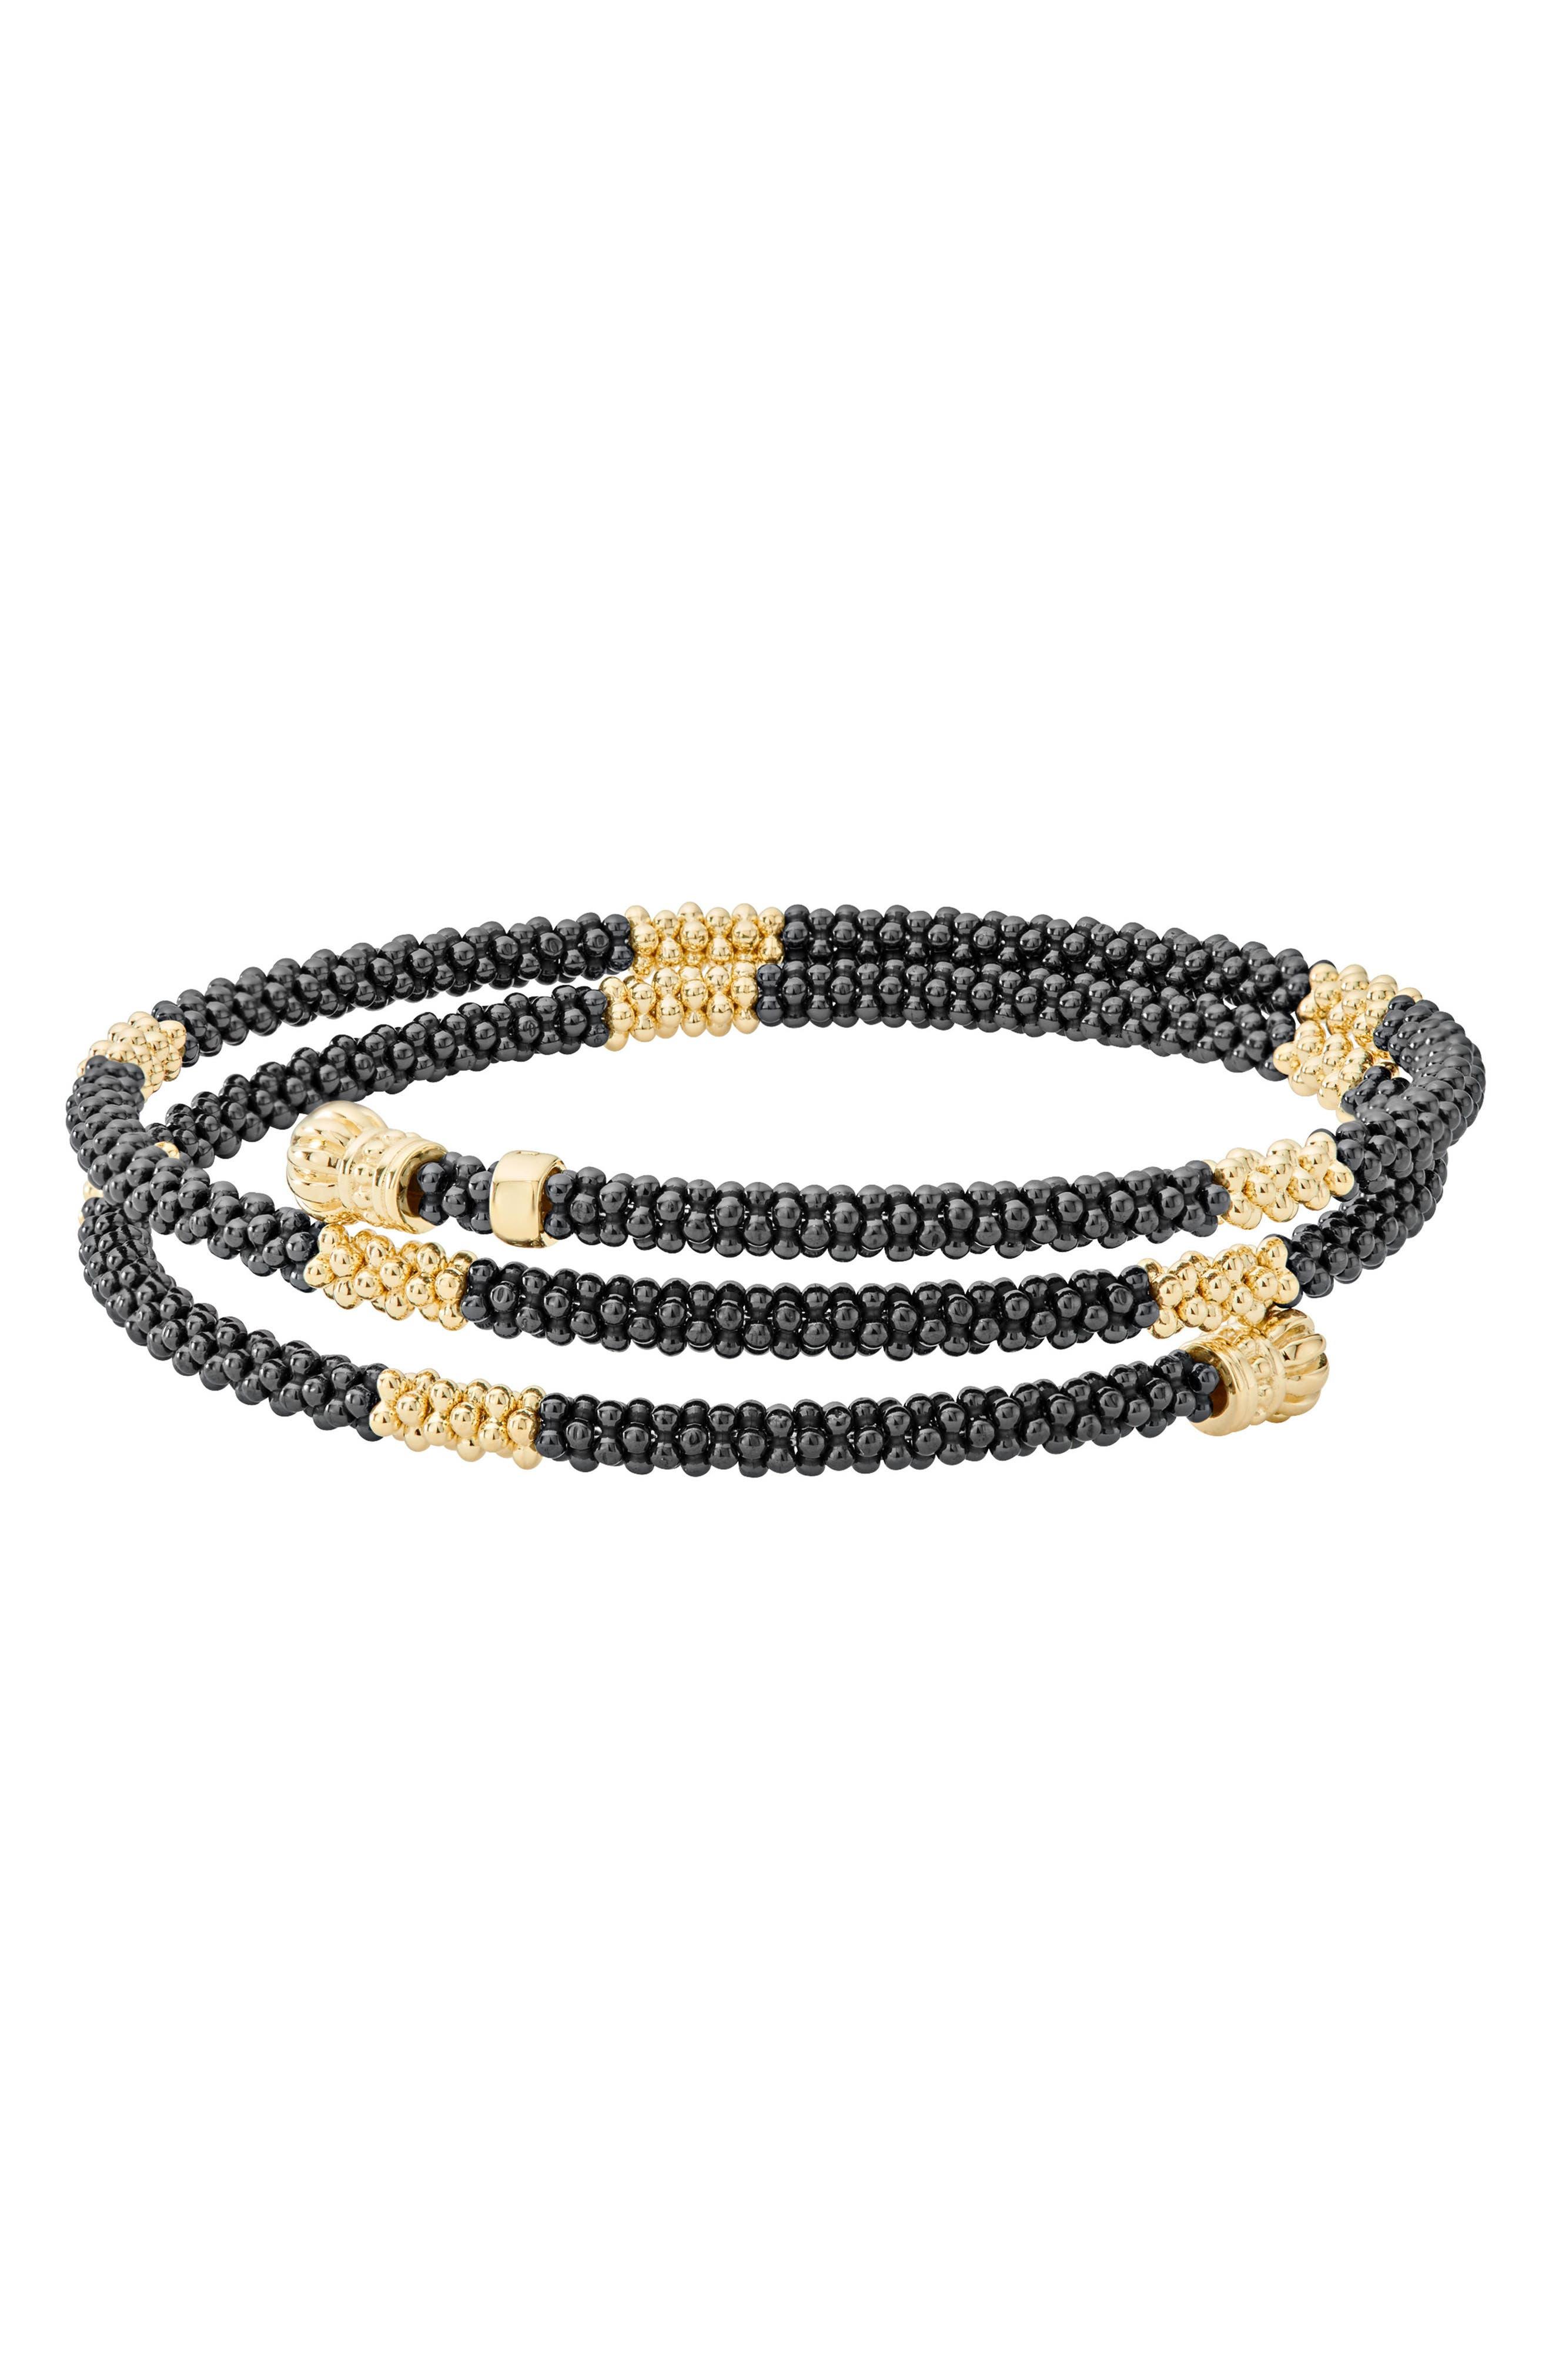 Gold & Black Caviar Coil Bracelet